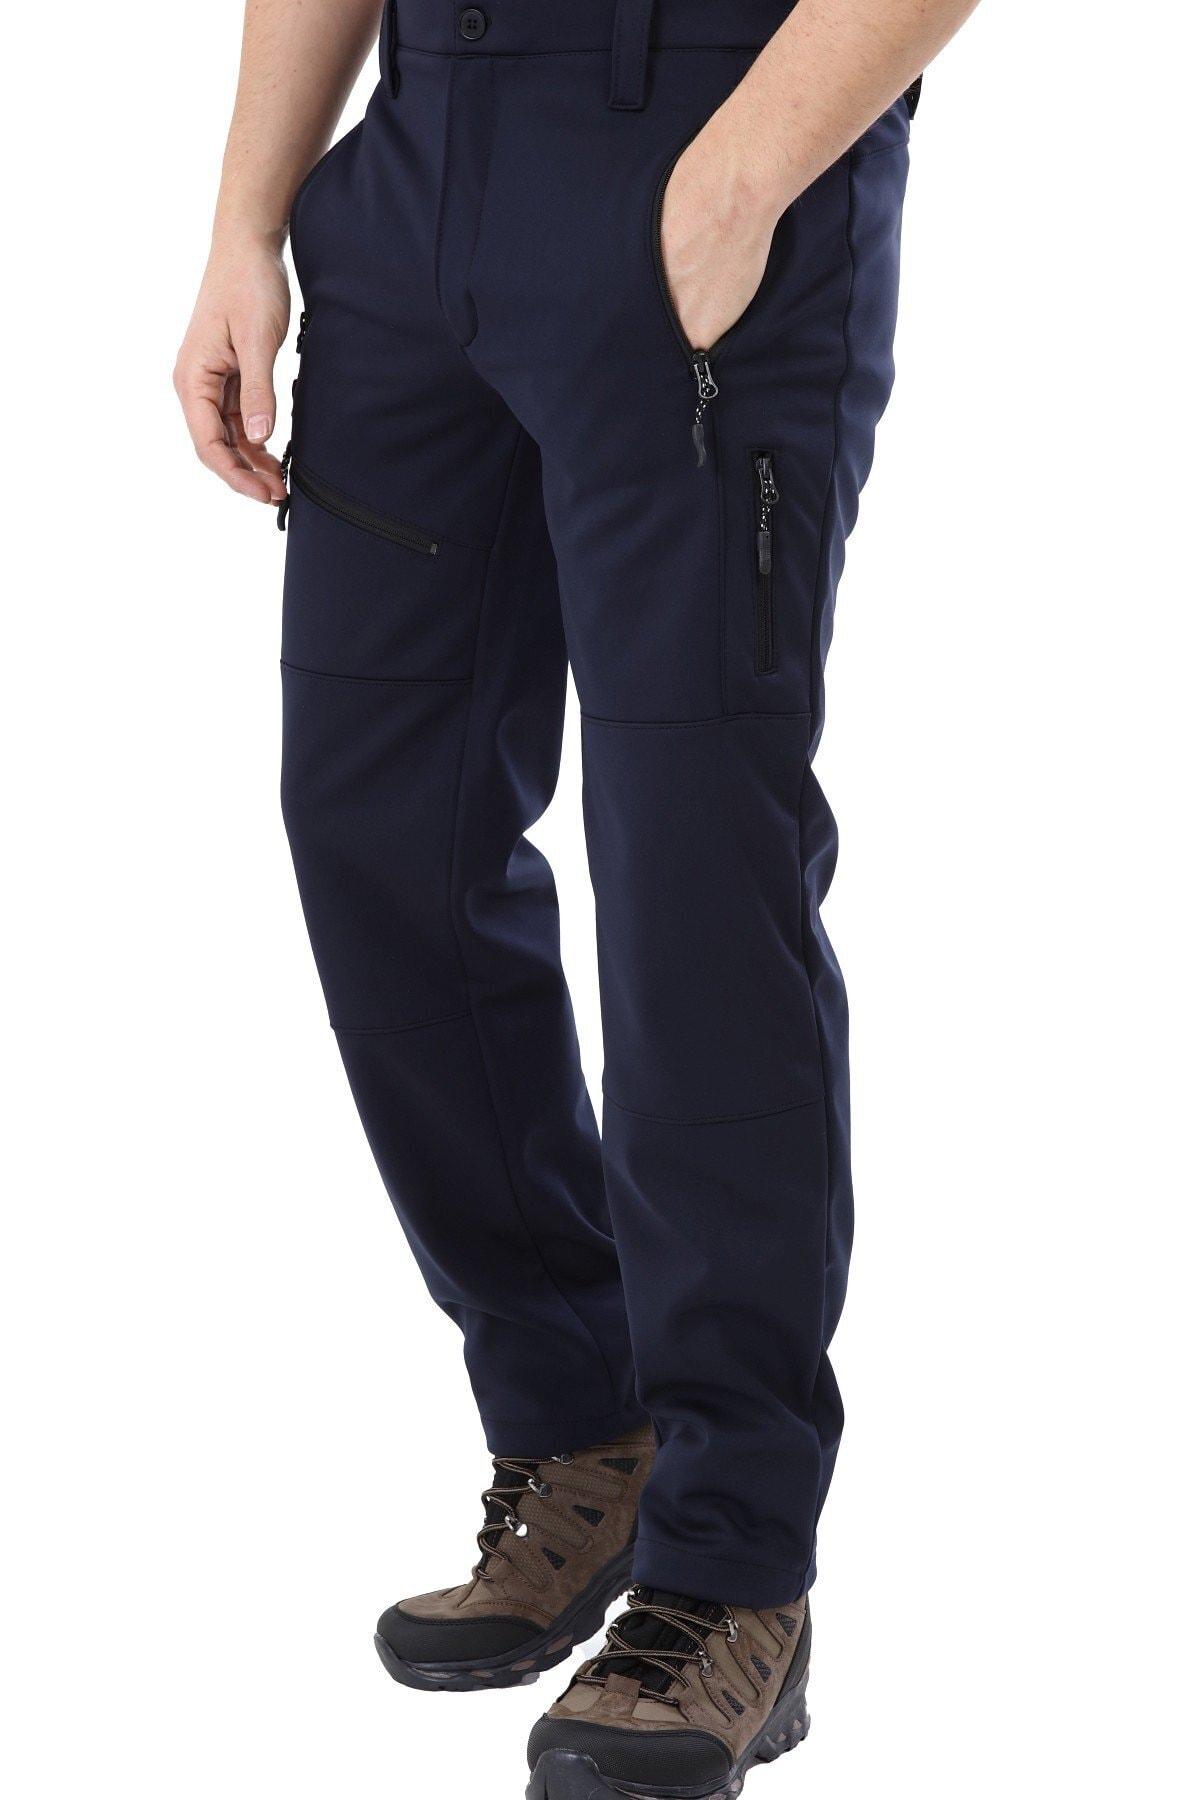 GHASSY CO. Erkek Tactical Outdoor Su Geçirmez Lacivert Softshell Pantolon 2